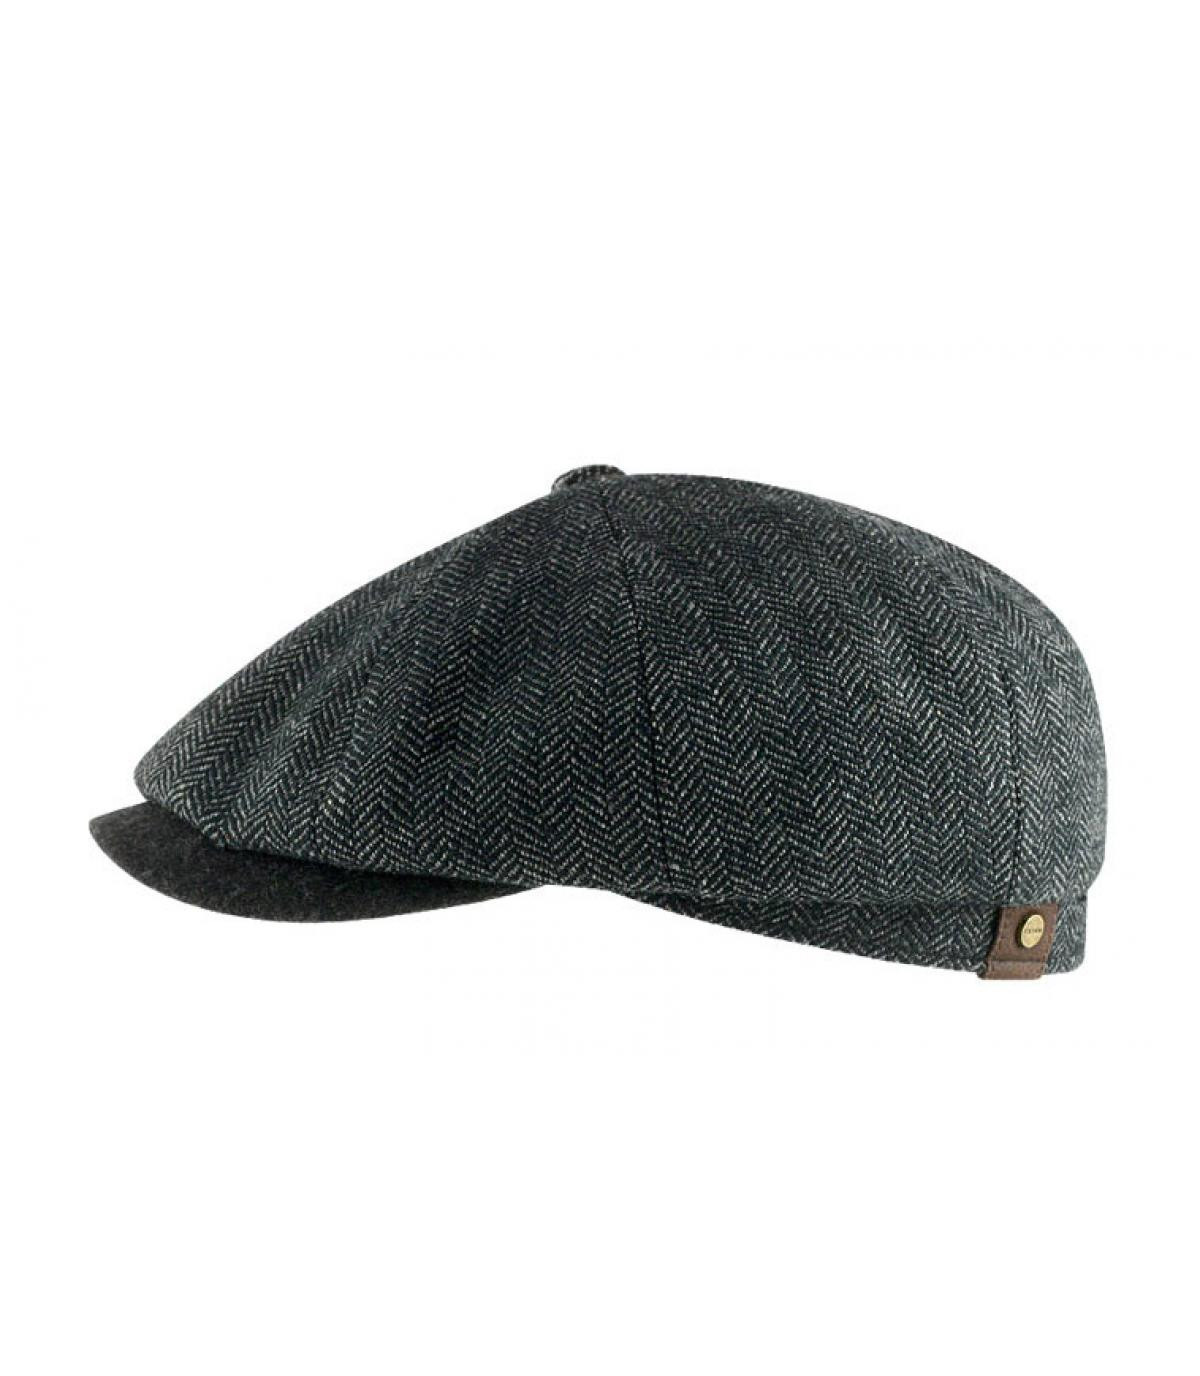 Cappellino Hatteras grigio scuro